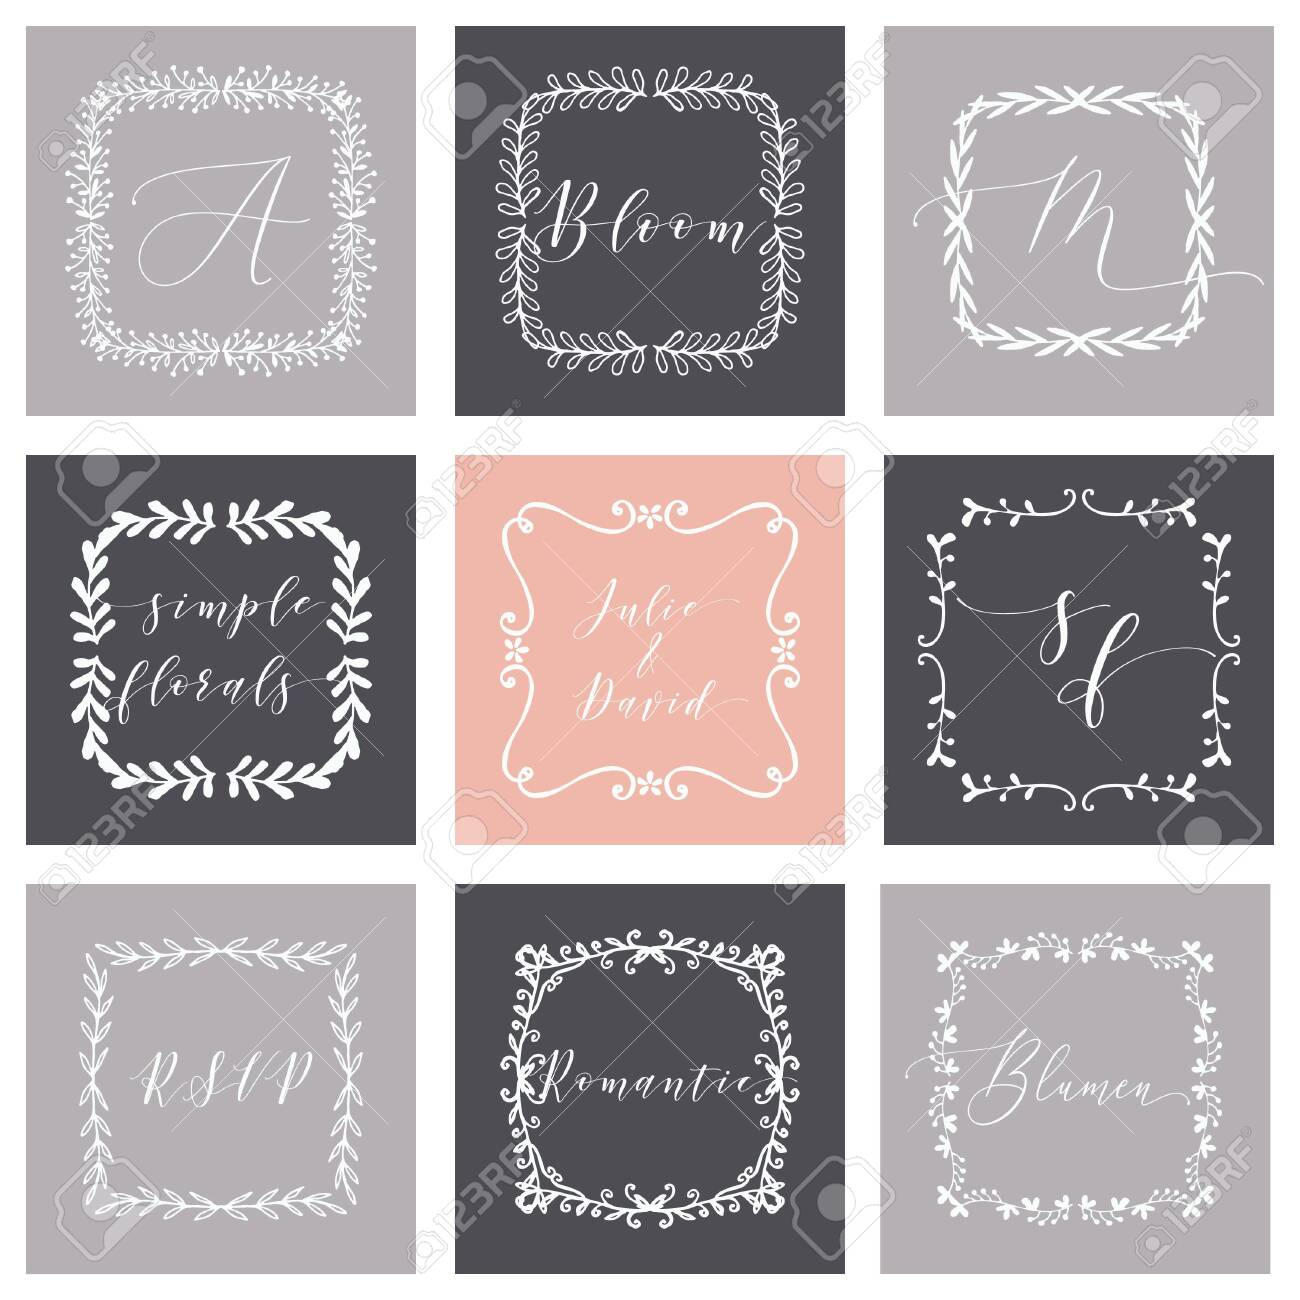 Floral Frame or Monogram Hand Drawn Element. Doodle Branches Border Illustration for Wedding Invitations, Greeting Card or Restaurant Menu. Hipster Hand Made Design Template. - 147320452